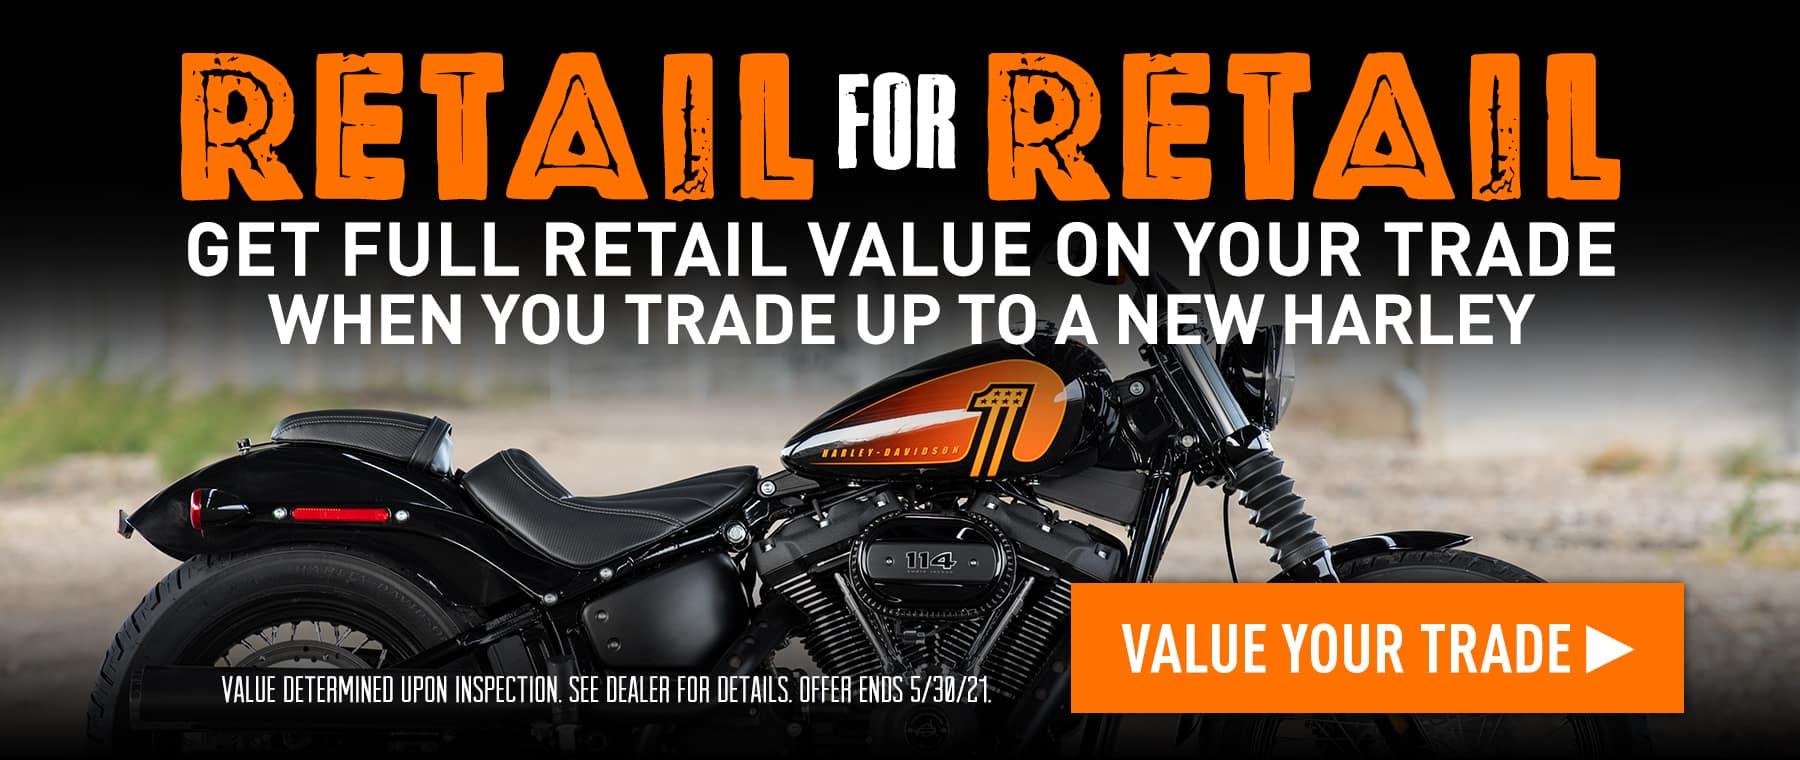 retail-for-retail_wb